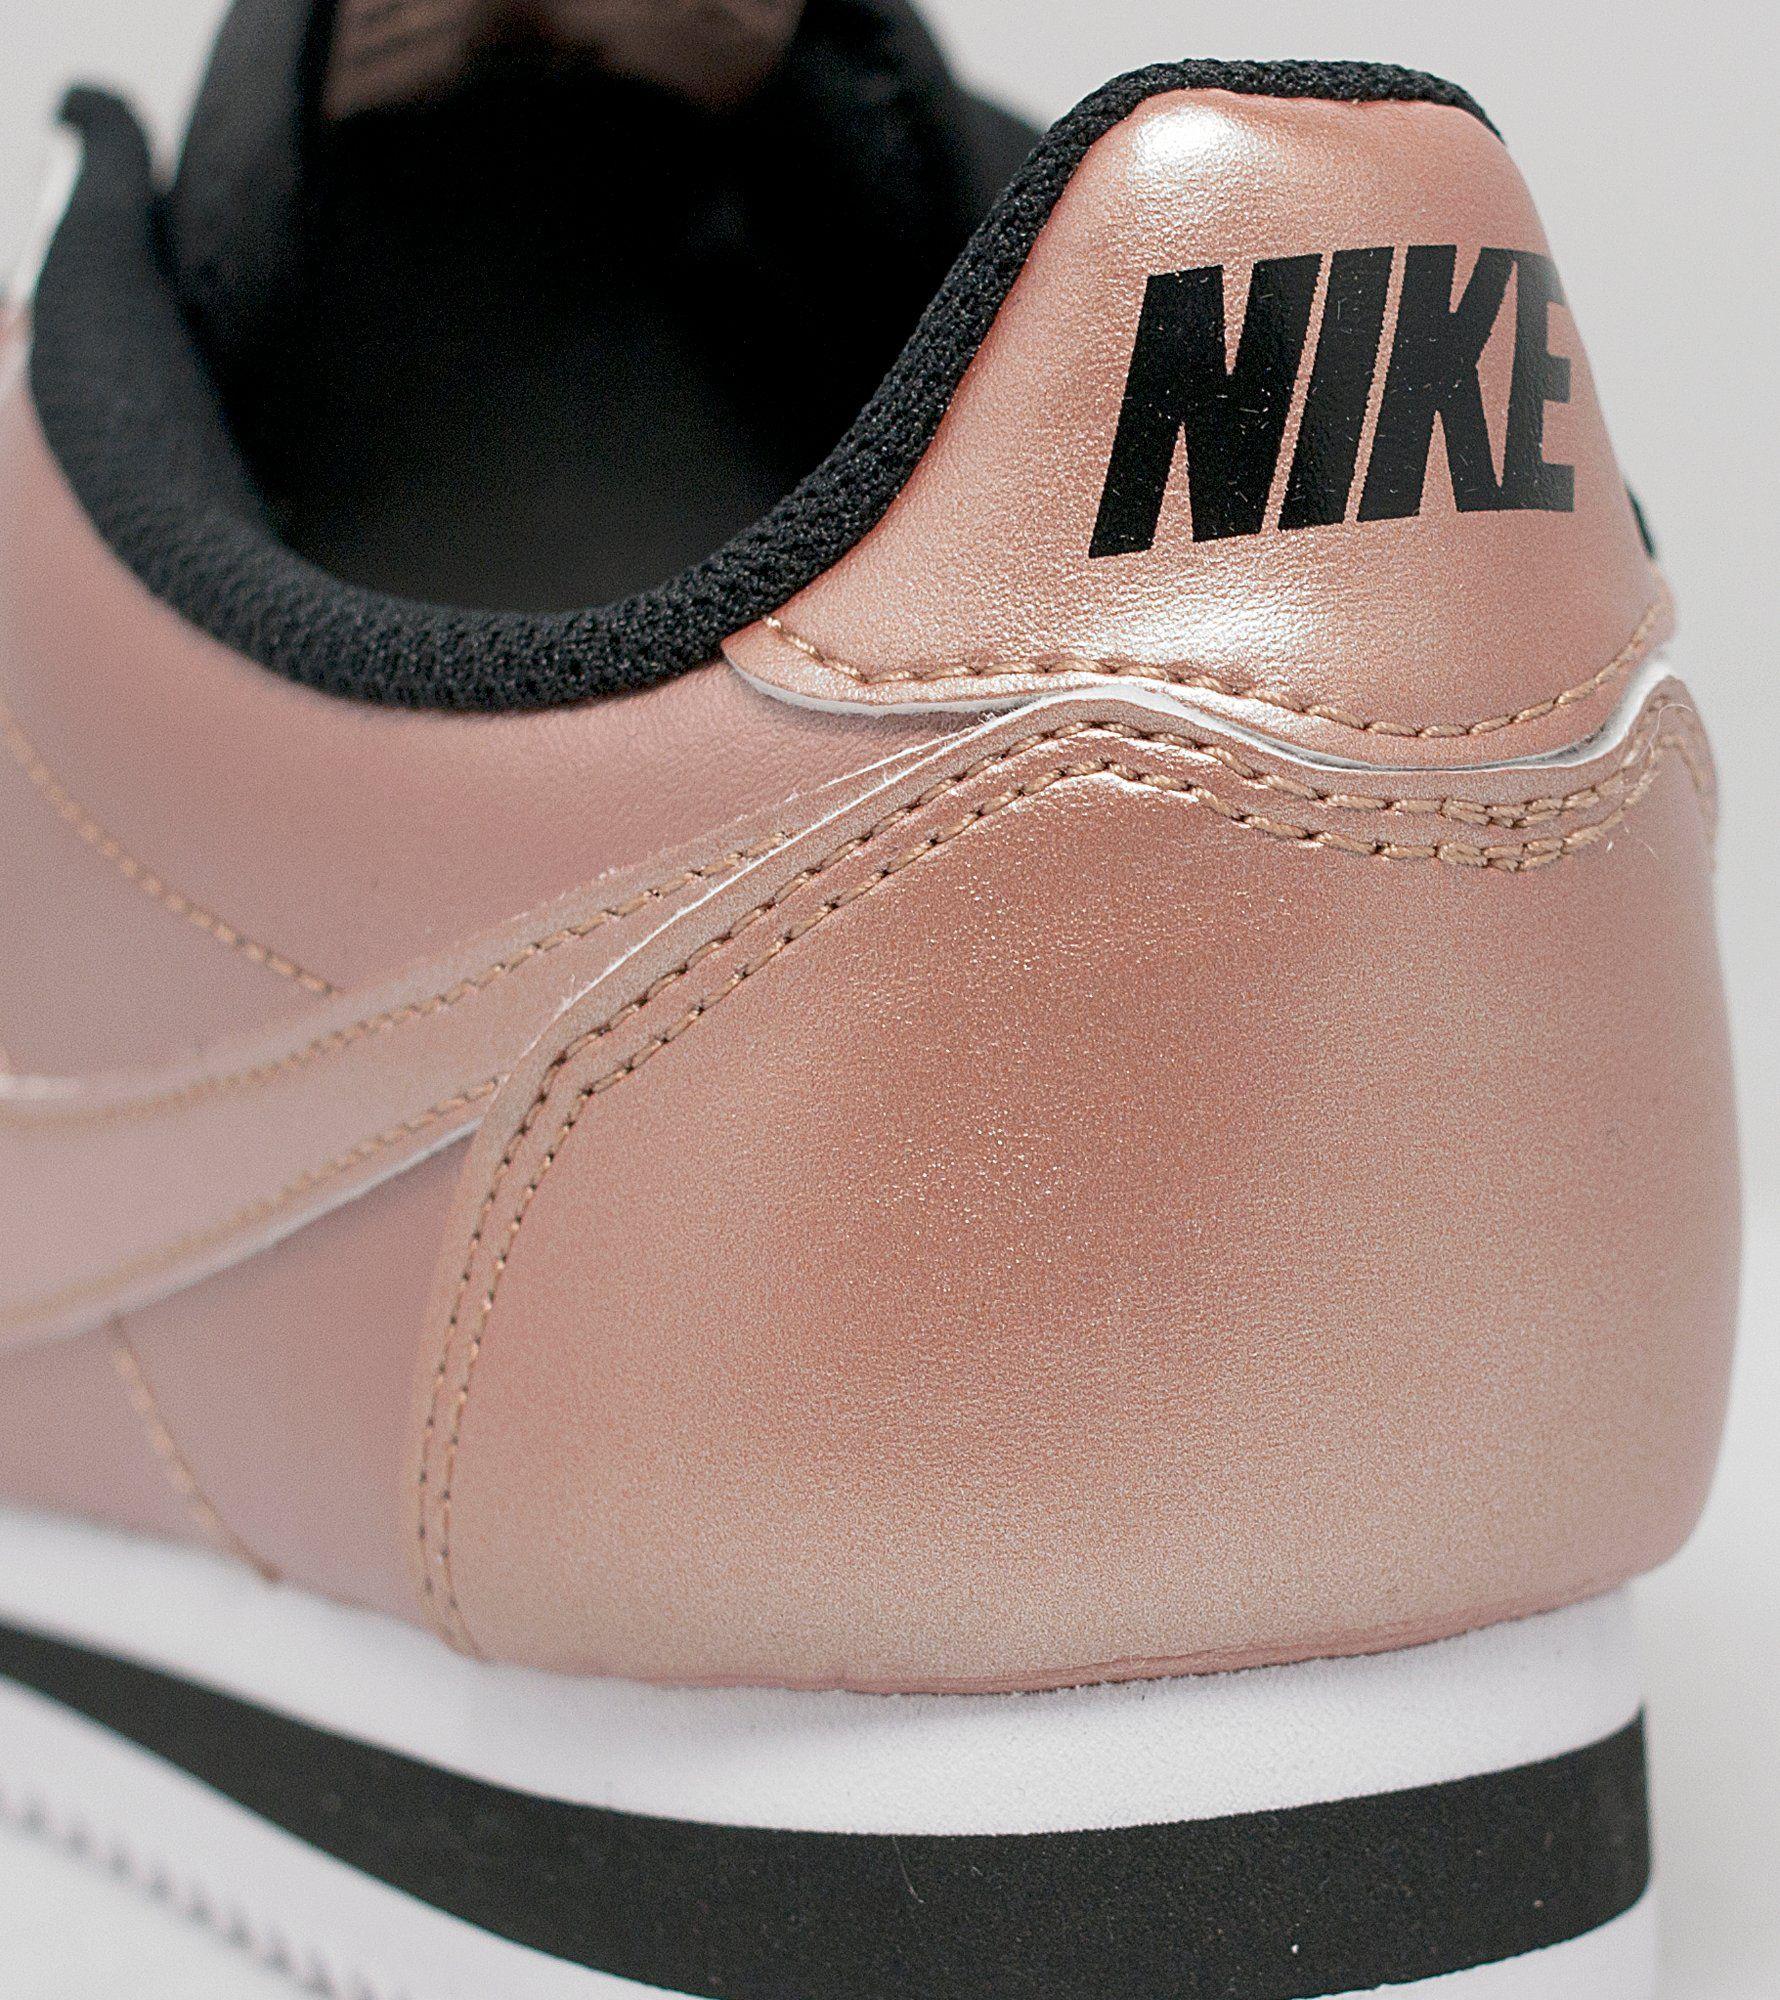 Nike Cortez Leather Women's